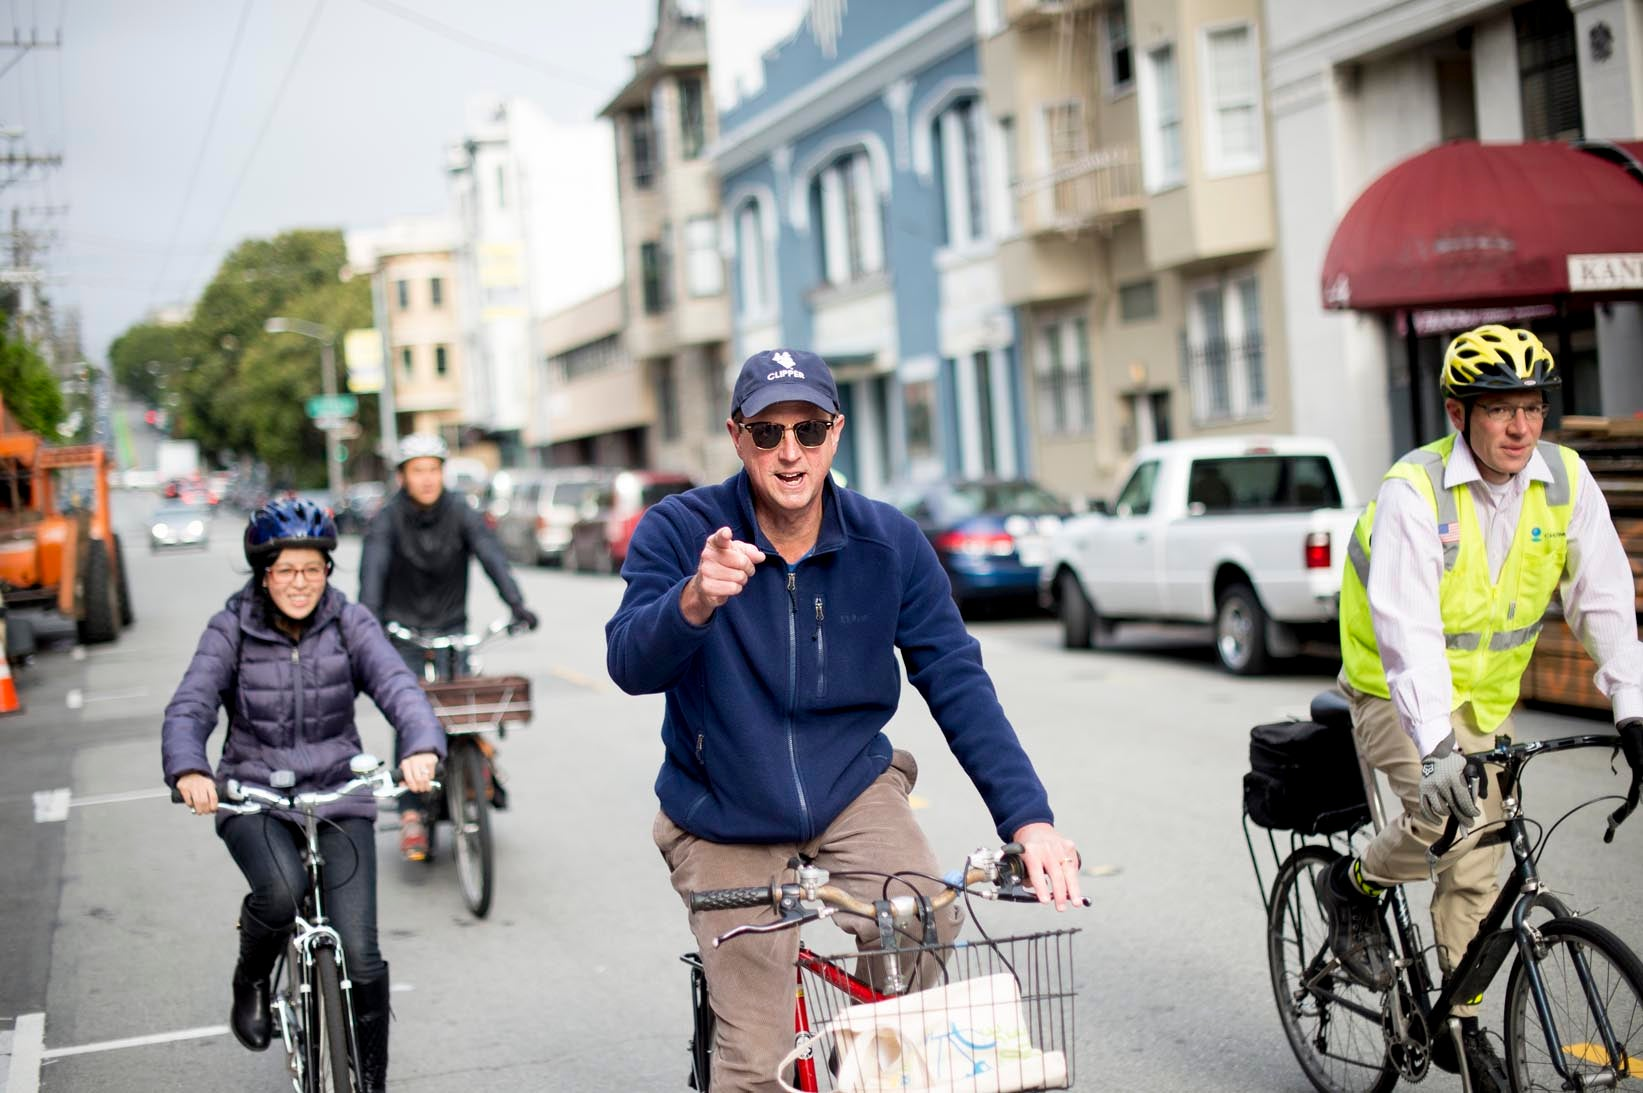 MTC Executive Director Steve Heminger biking to work